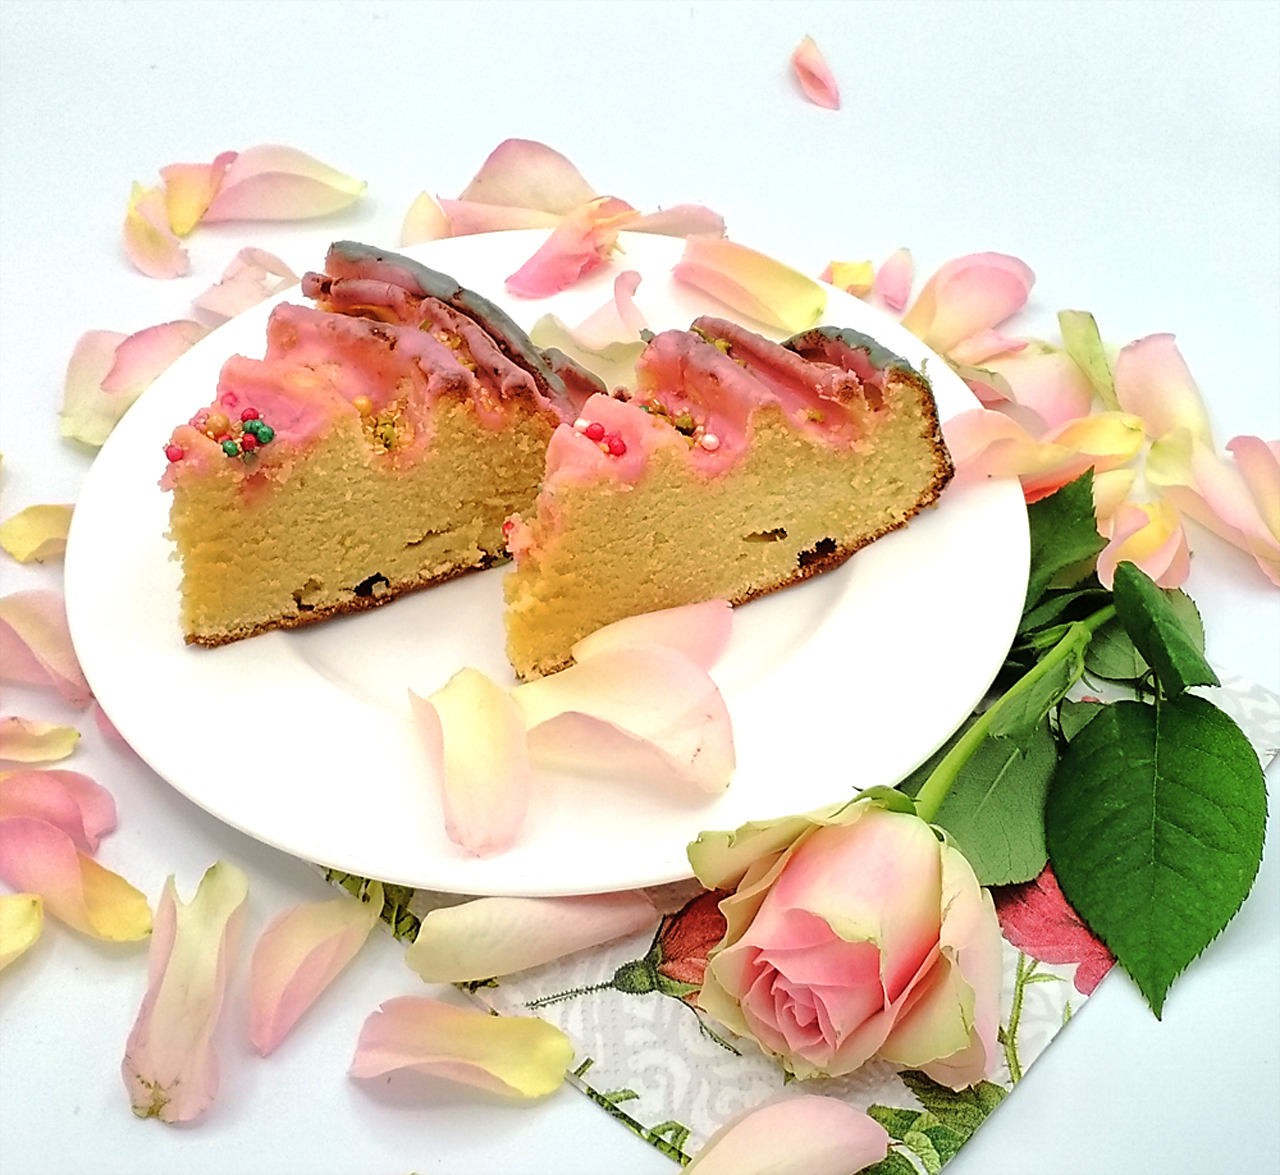 ciasto krecone z marcepanem i lukrem z Ouzo